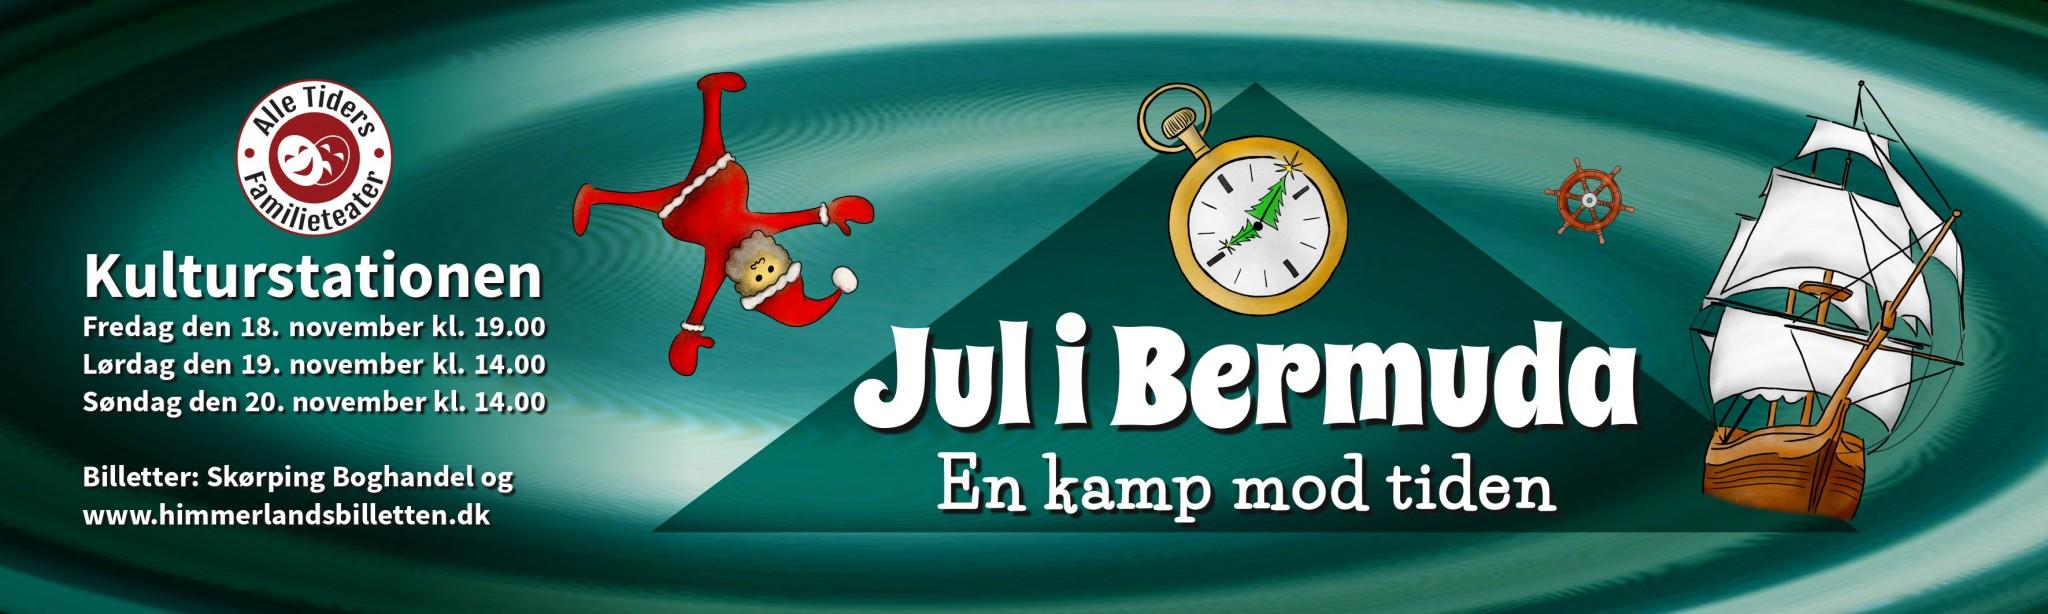 Jul i Bermuda banner